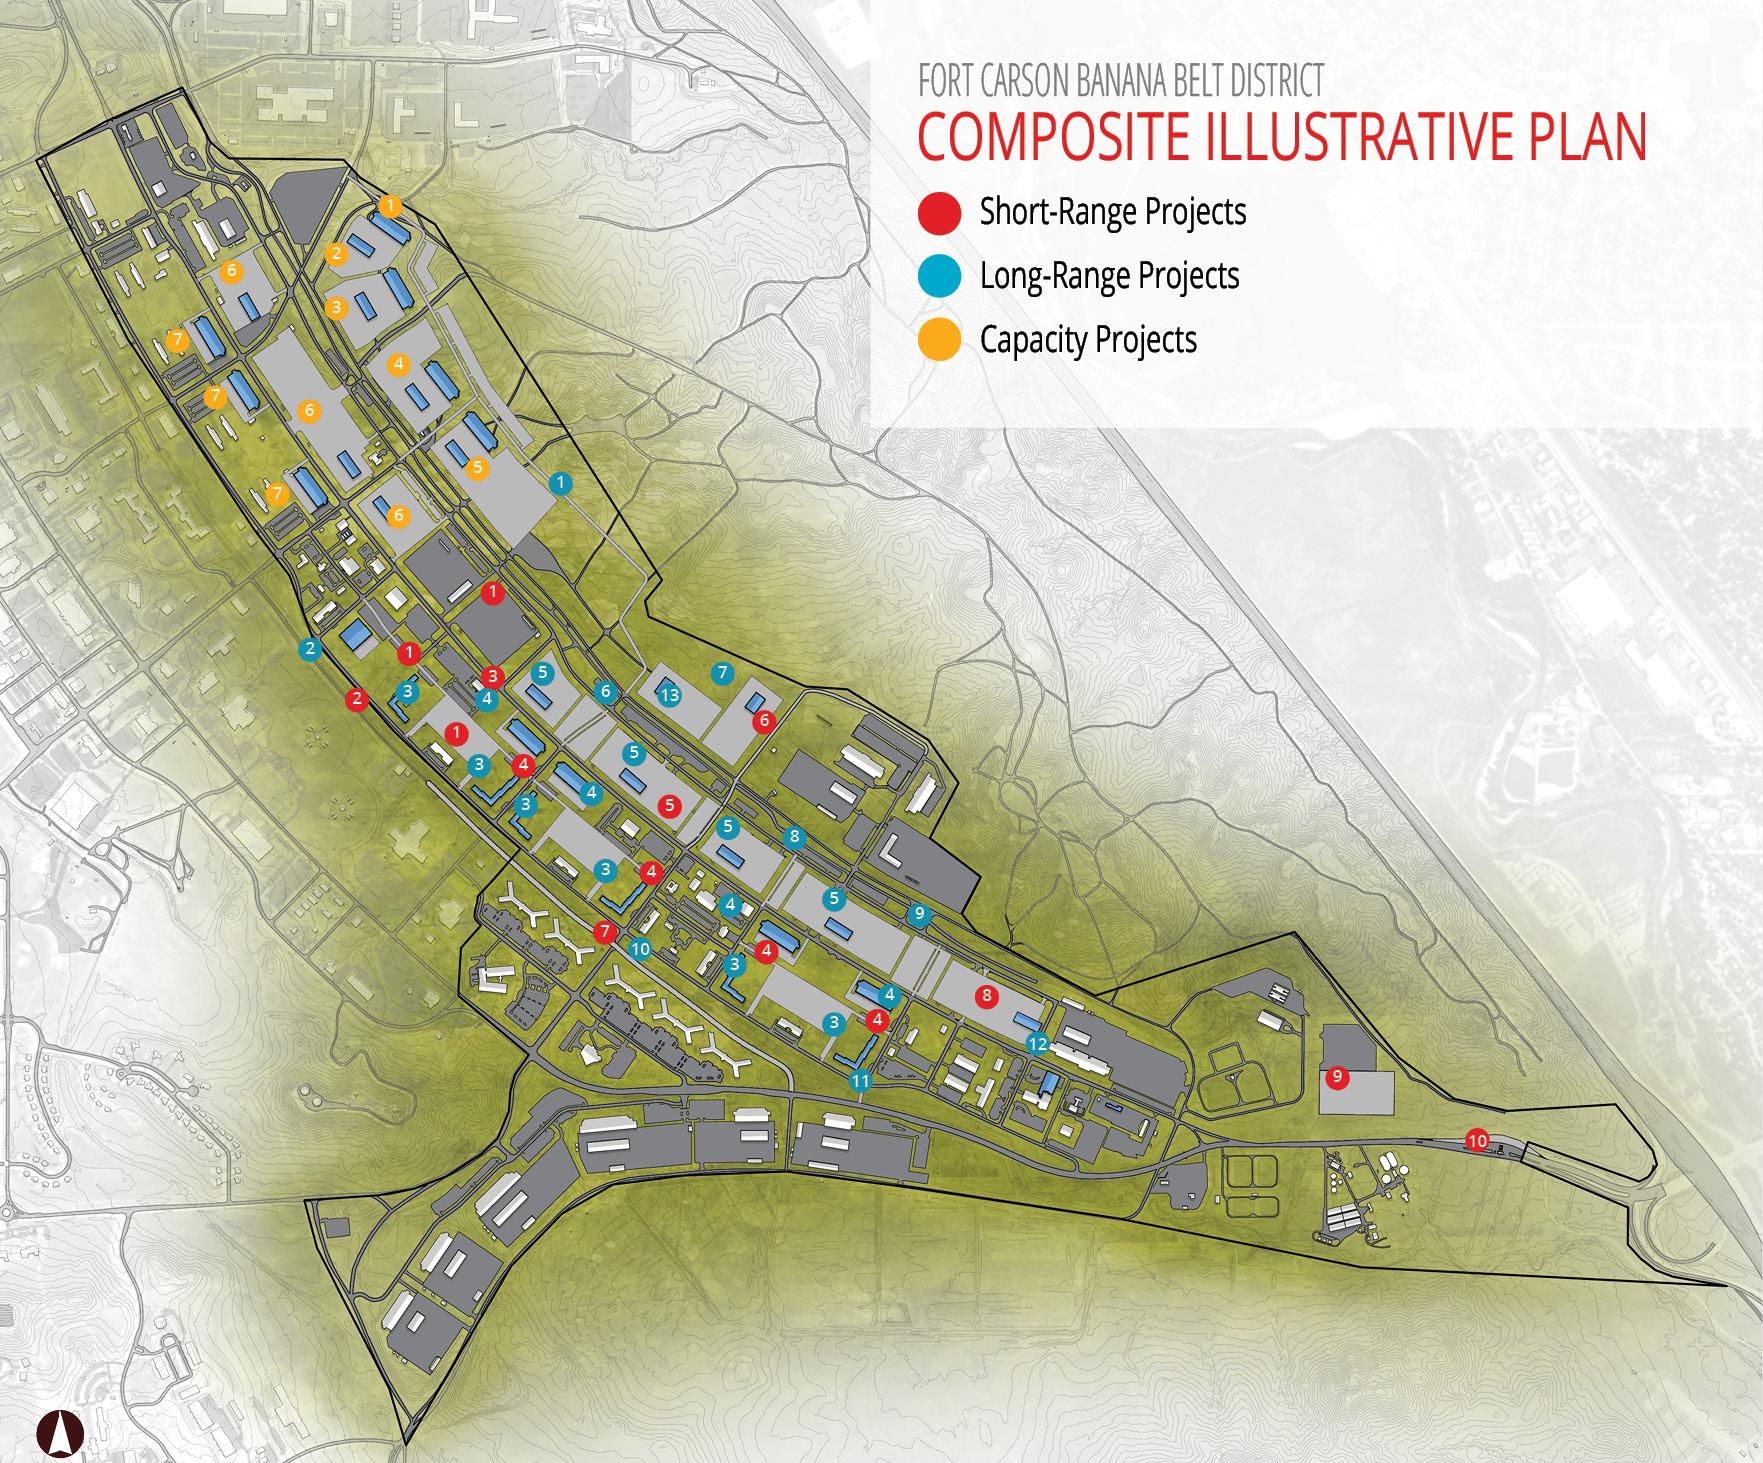 Composite Illustrative Plans2.jpg